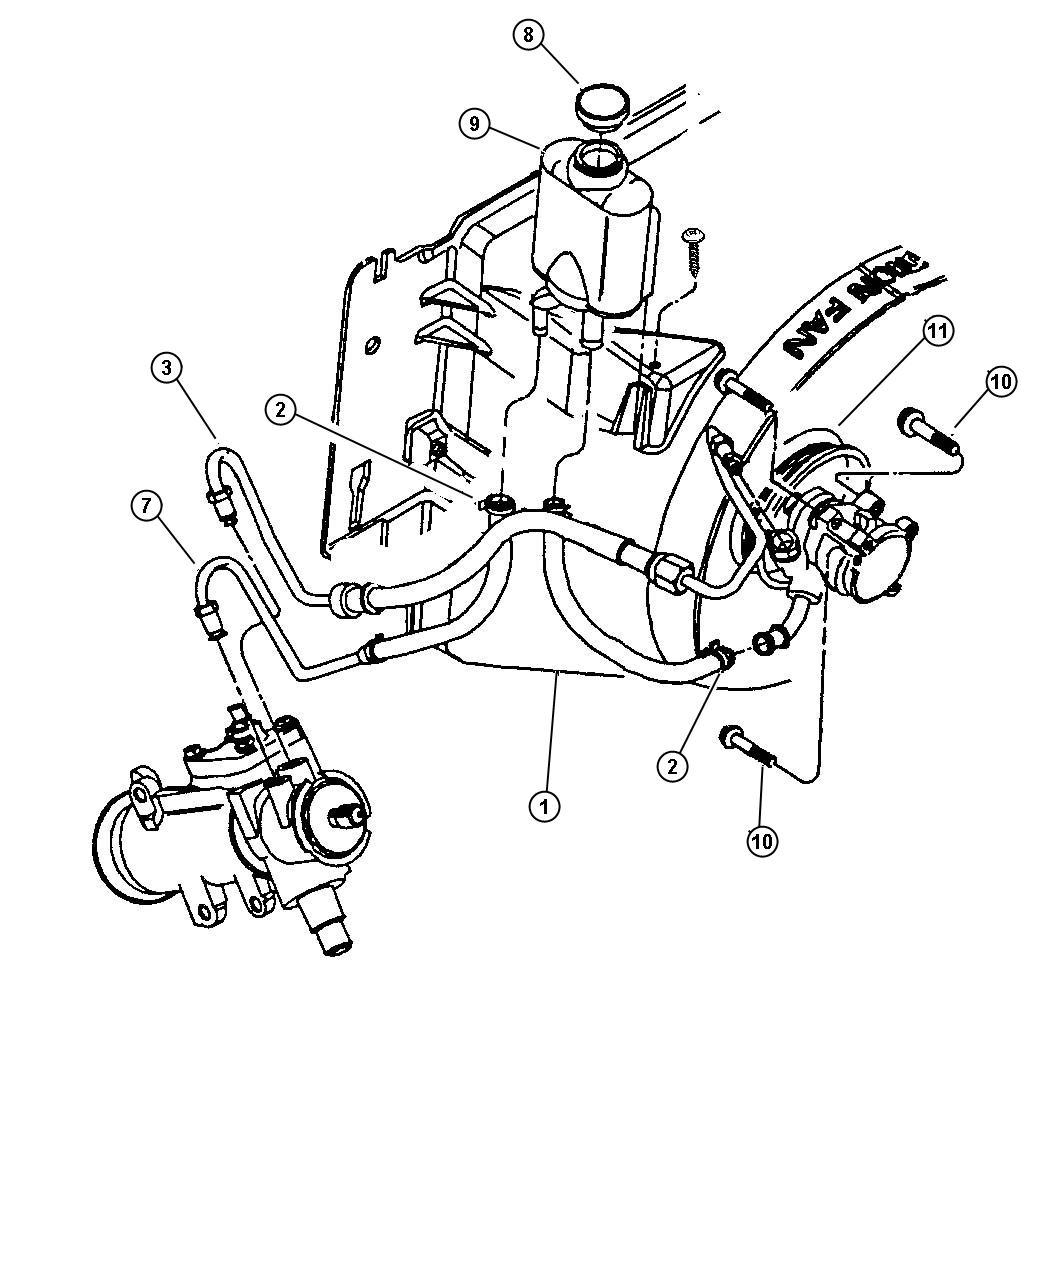 1997 Jeep Wrangler Reservoir  Power Steering Pump  Engine